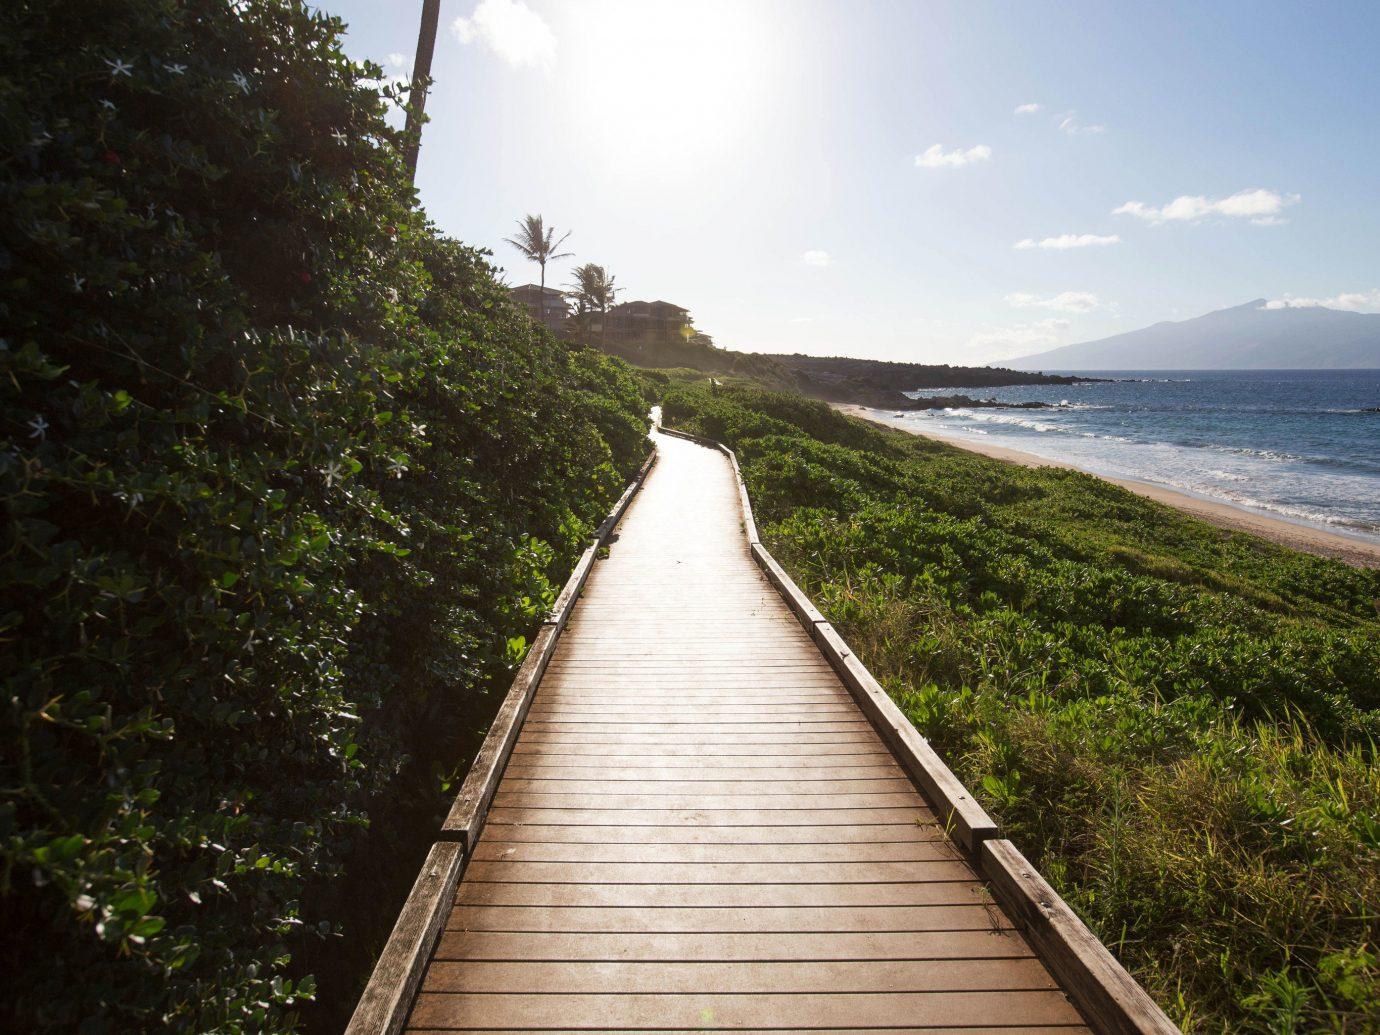 Beach sky outdoor tree grass water River wooden Coast vacation Sea walkway sunlight waterway overlooking lush